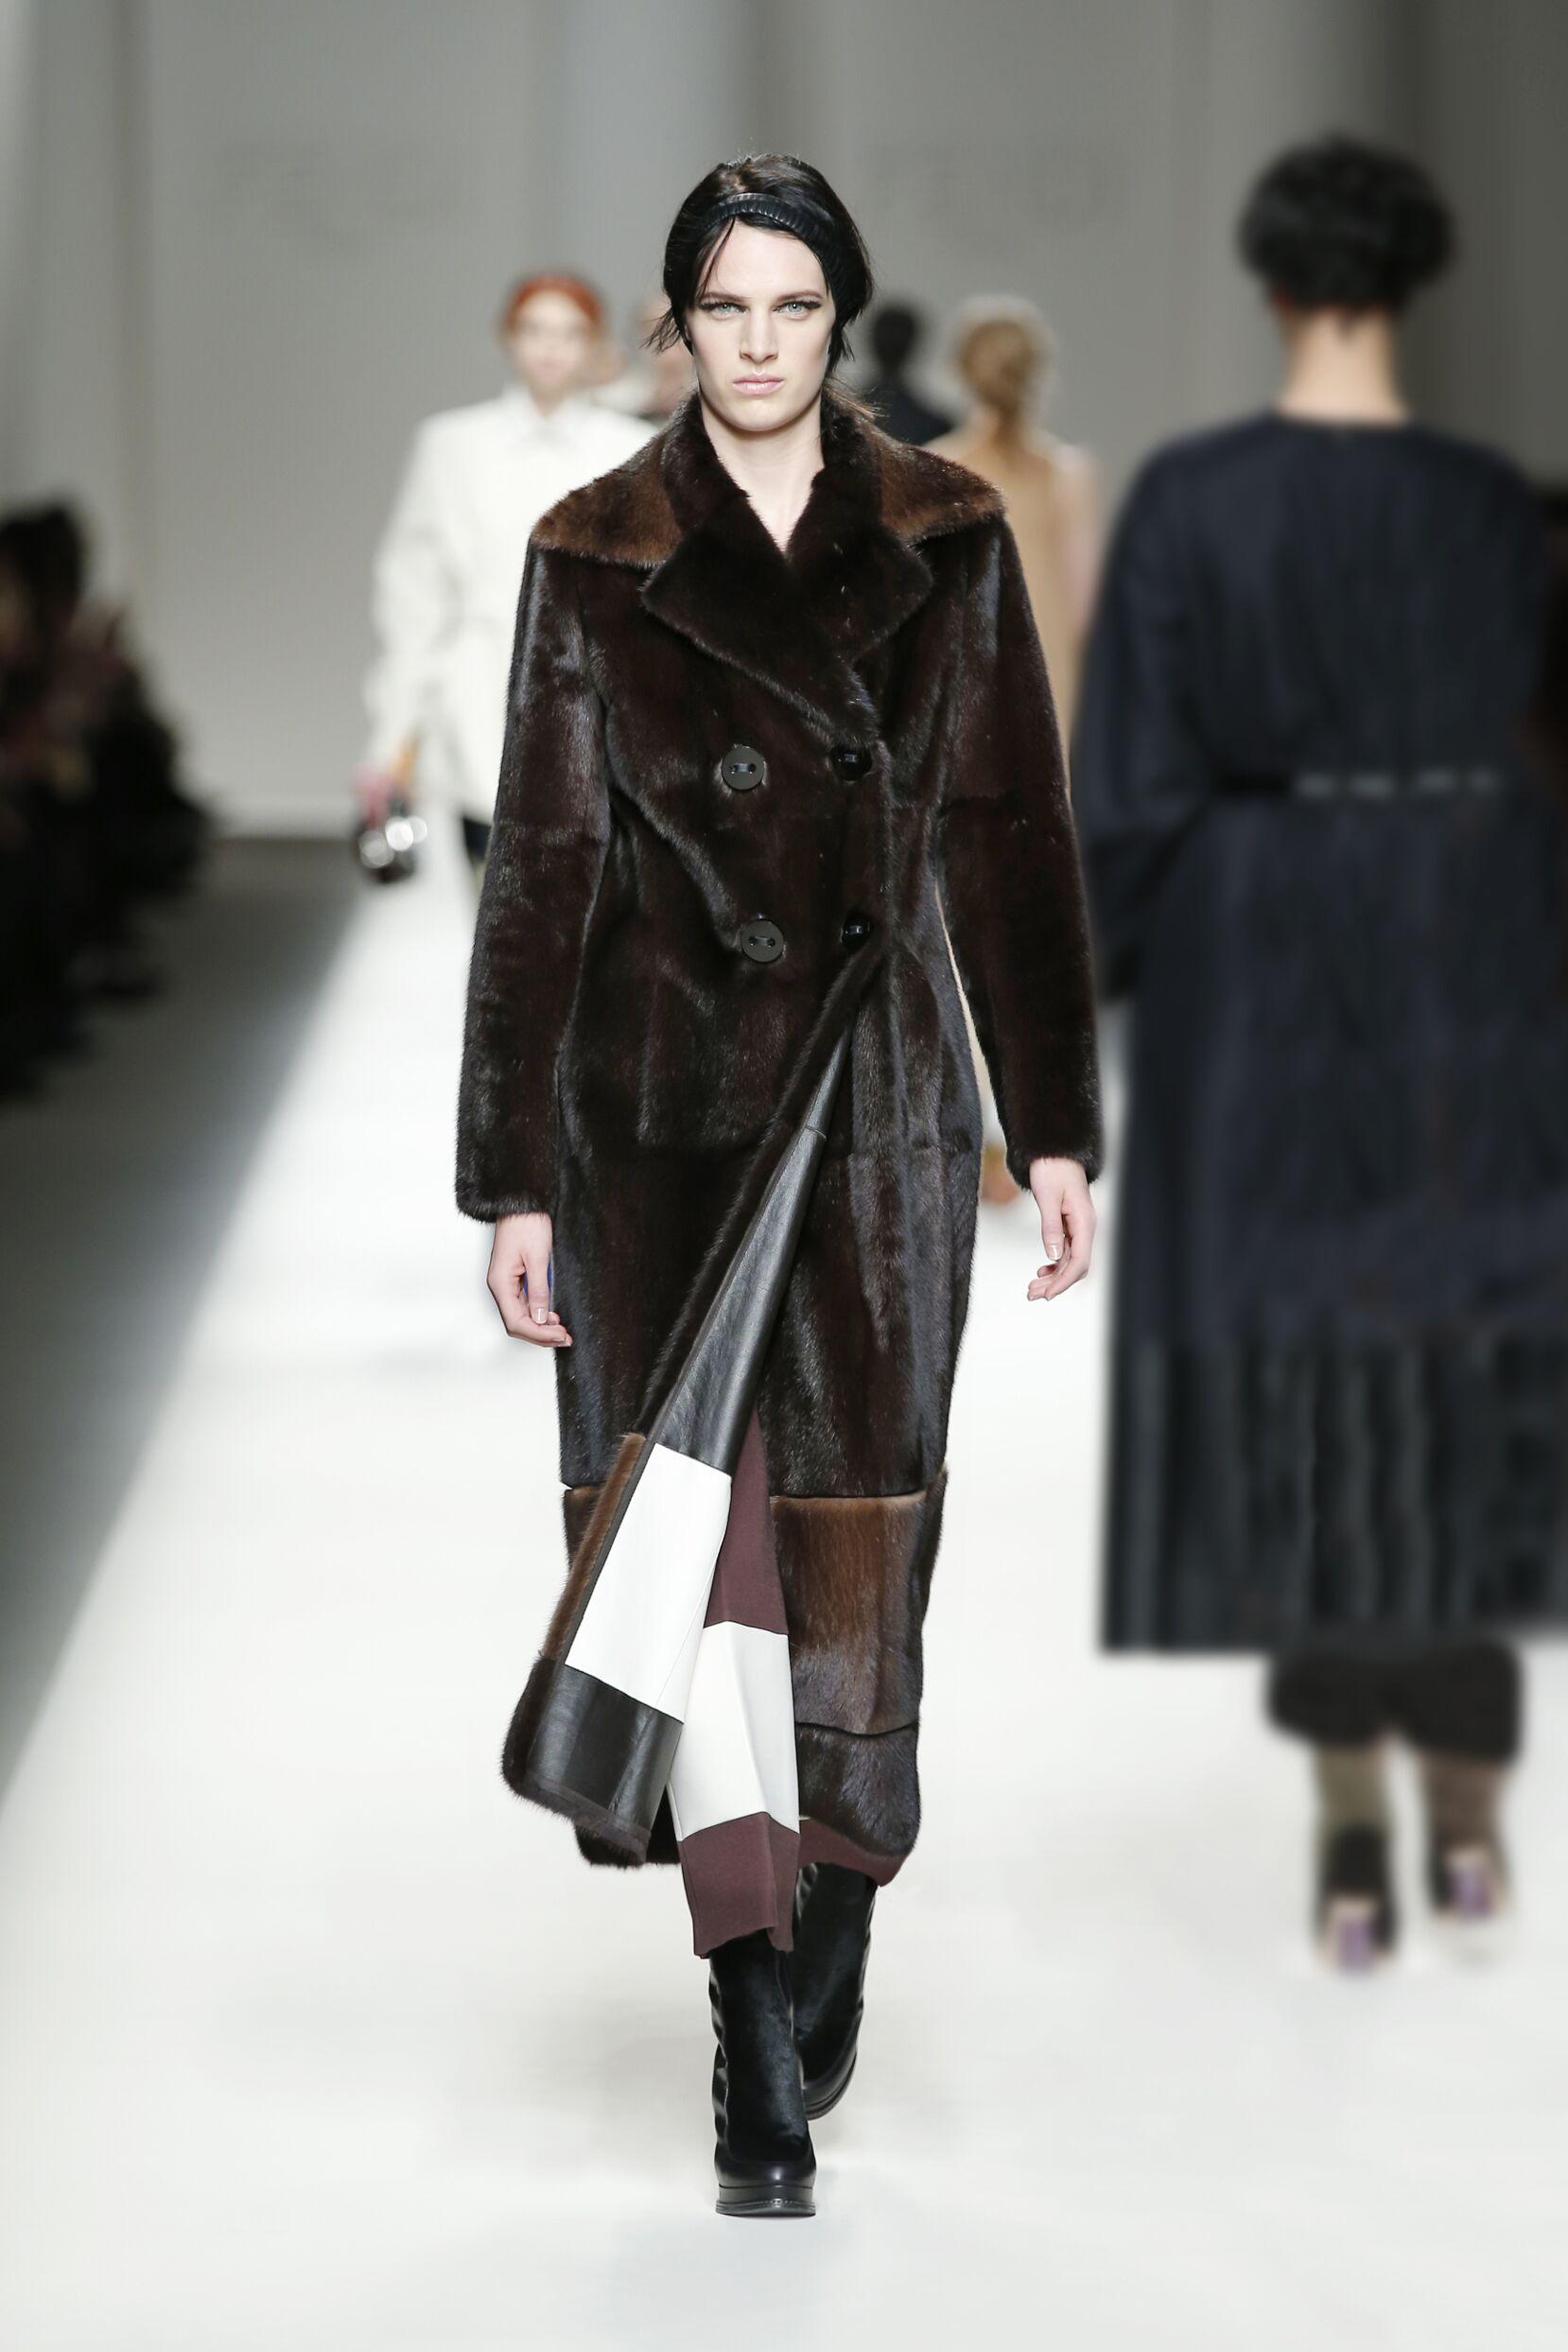 Catwalk Fendi Fall Winter 2015 16 Women's Collection Milan Fashion Week